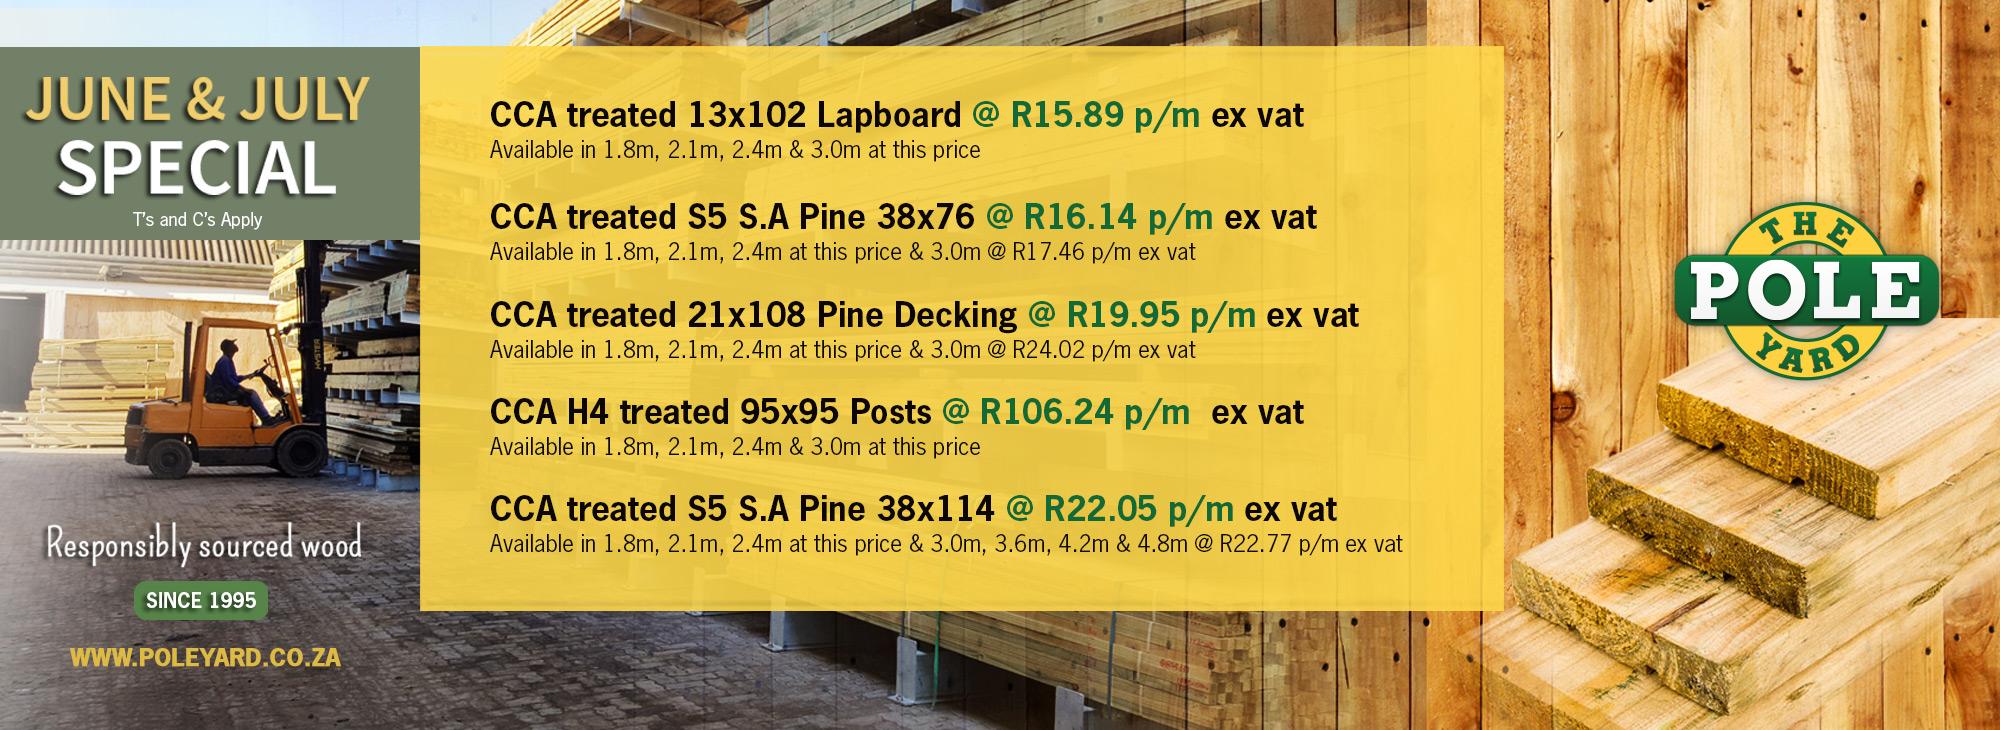 PoleYard Cape Town Specials